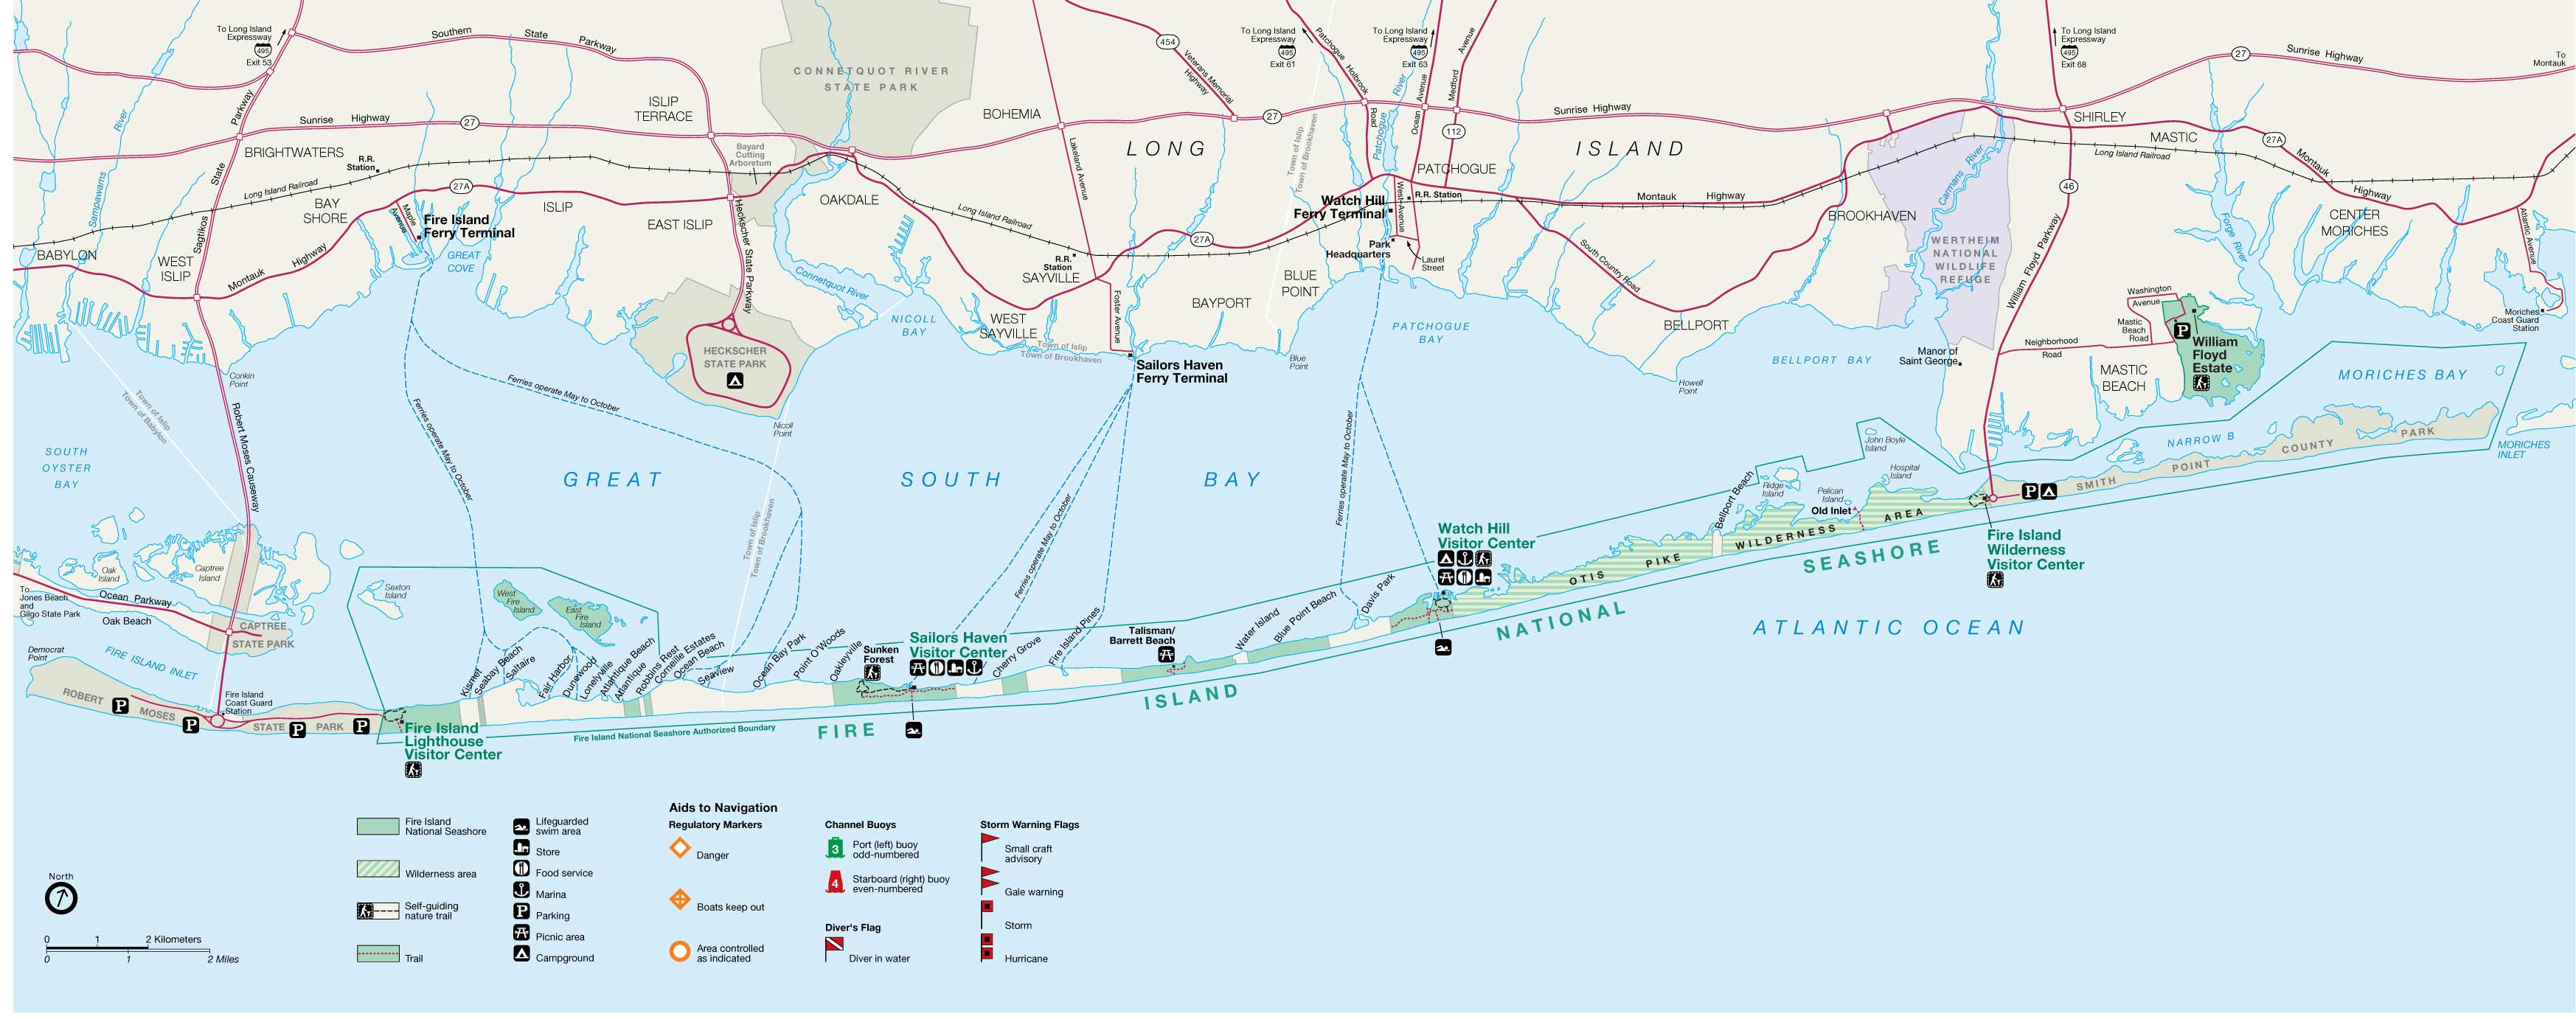 Map Of Kismet Fire Island